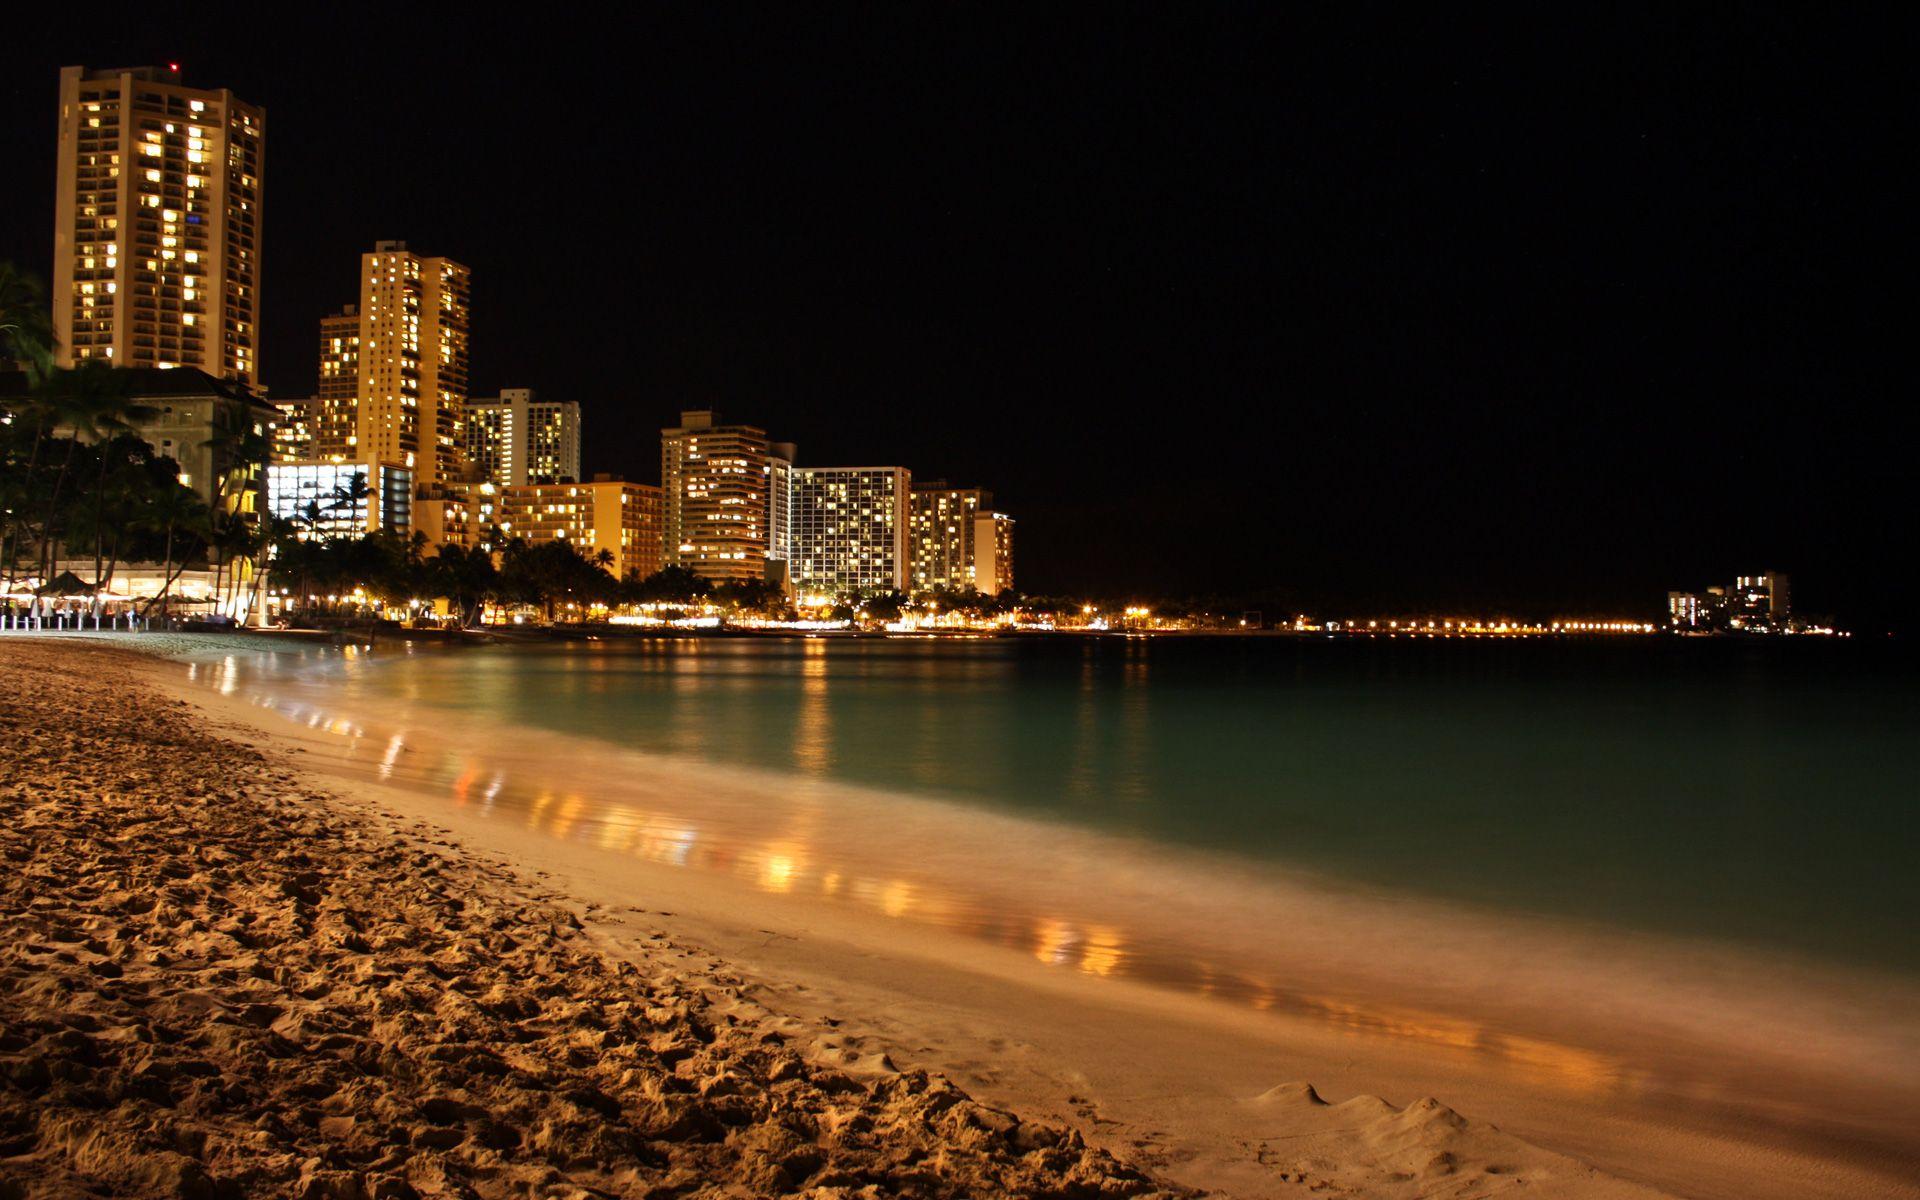 Night Beach HD Wallpaper